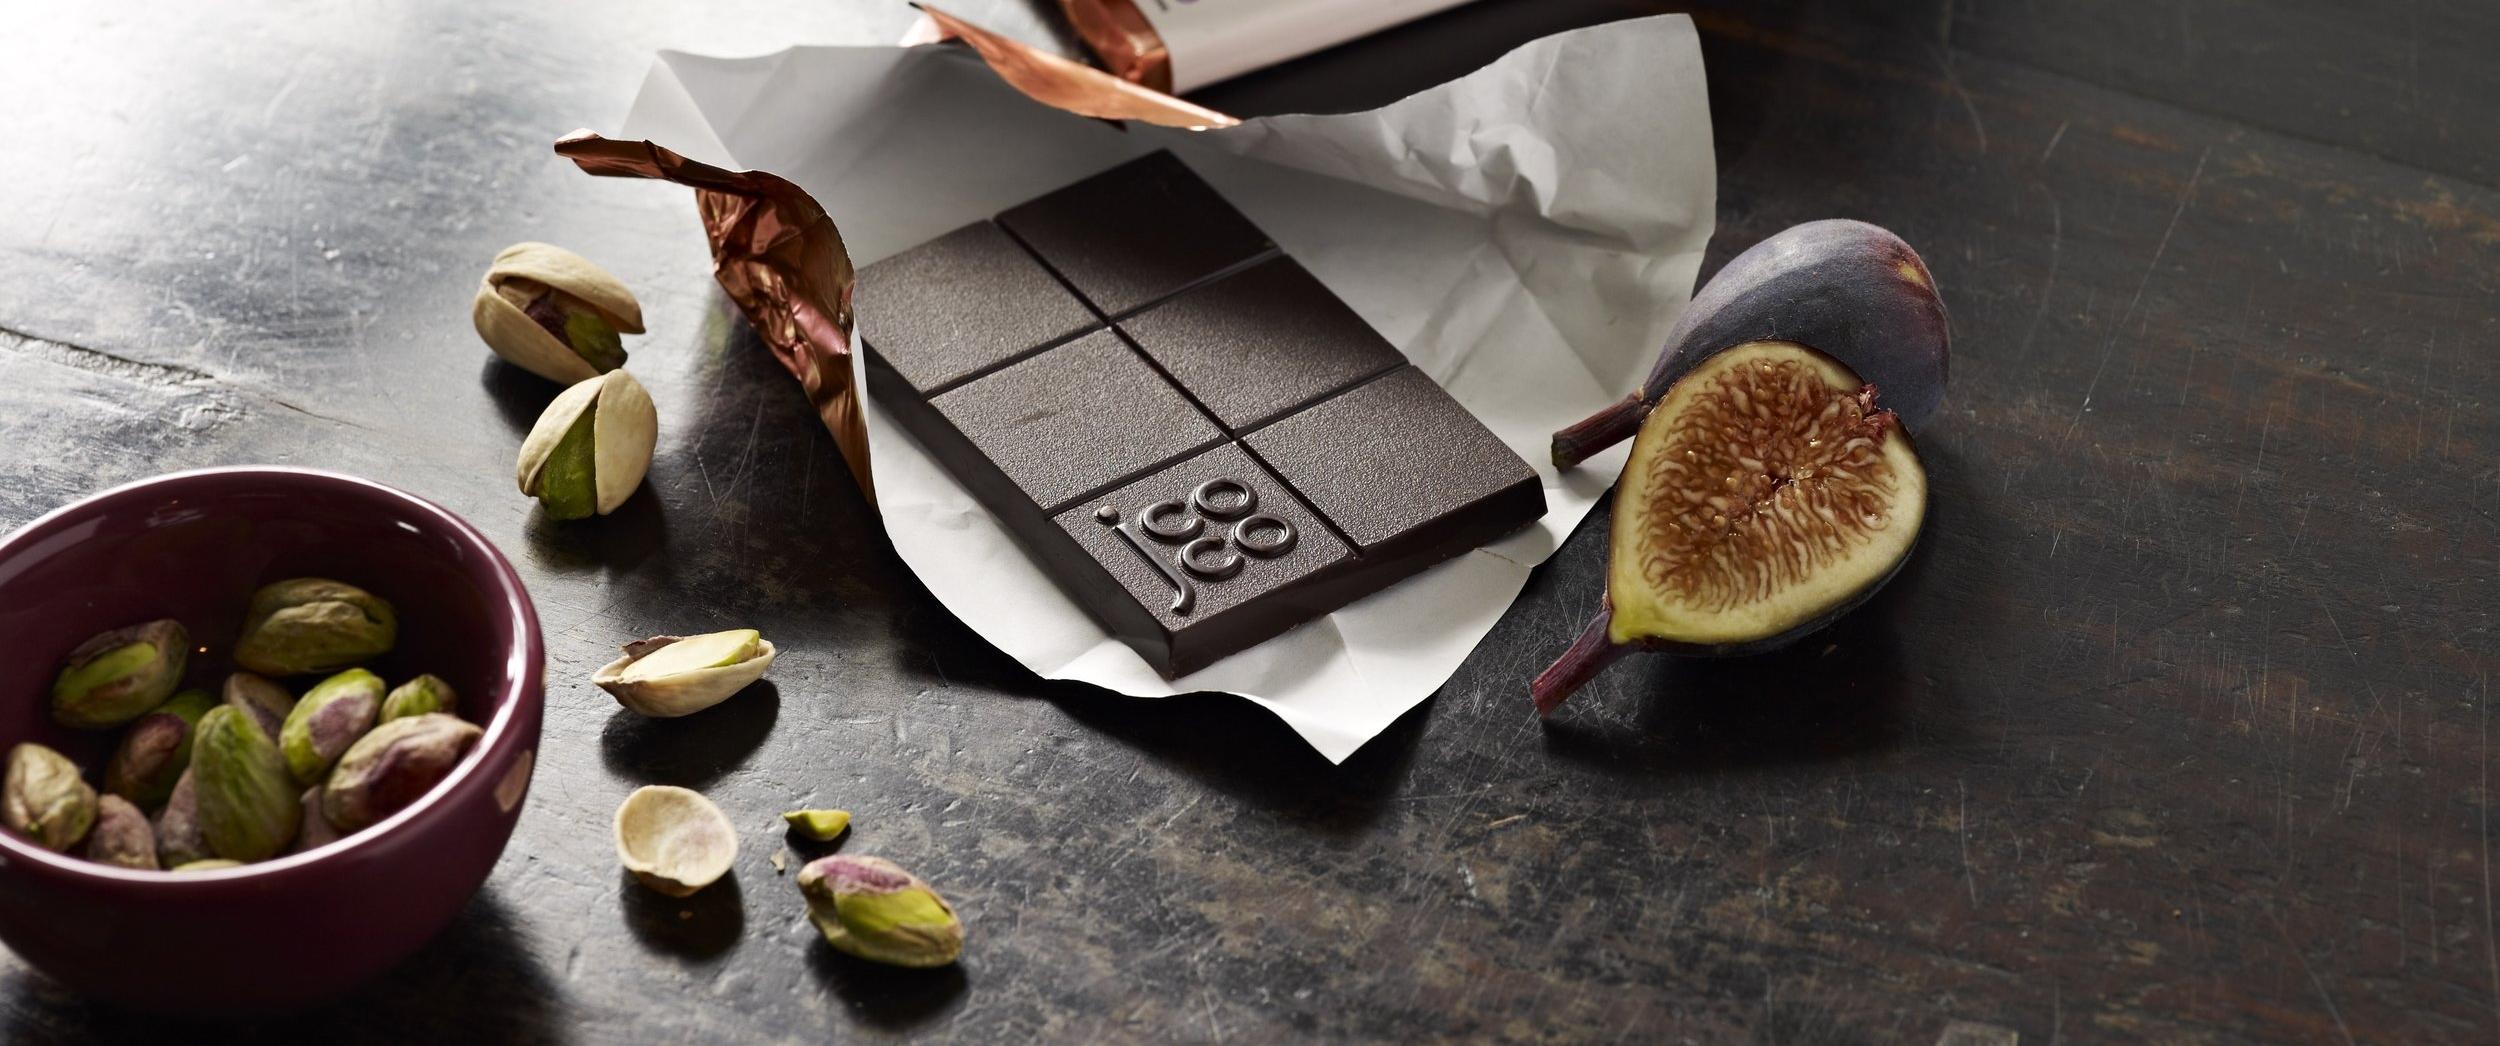 Black fig pistachio copy.jpg